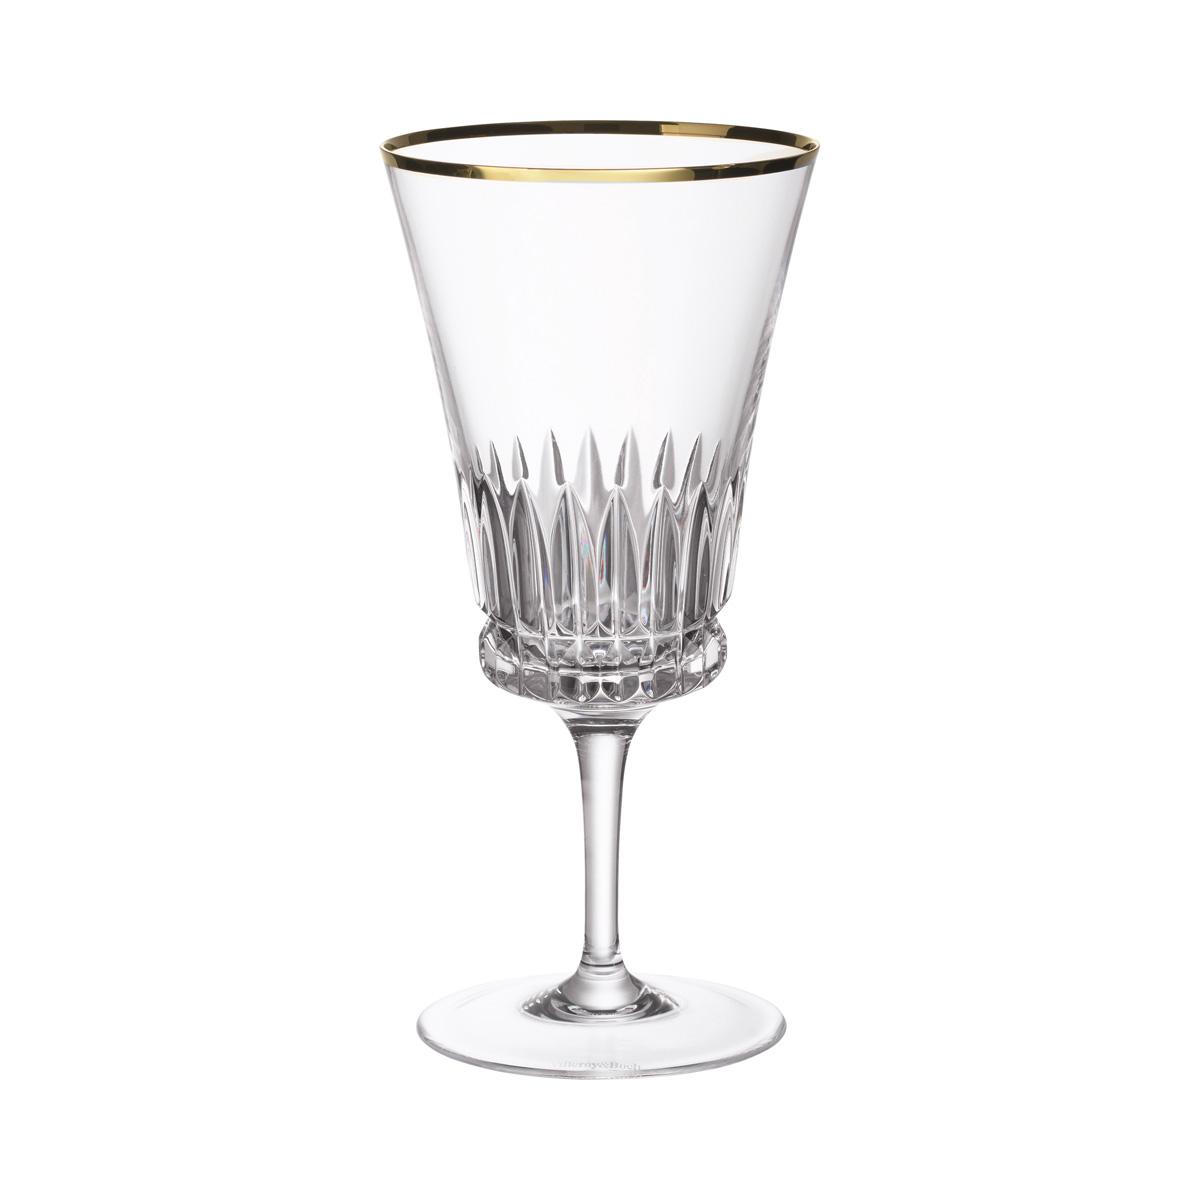 Villeroy and Boch Grand Royal Gold Goblet